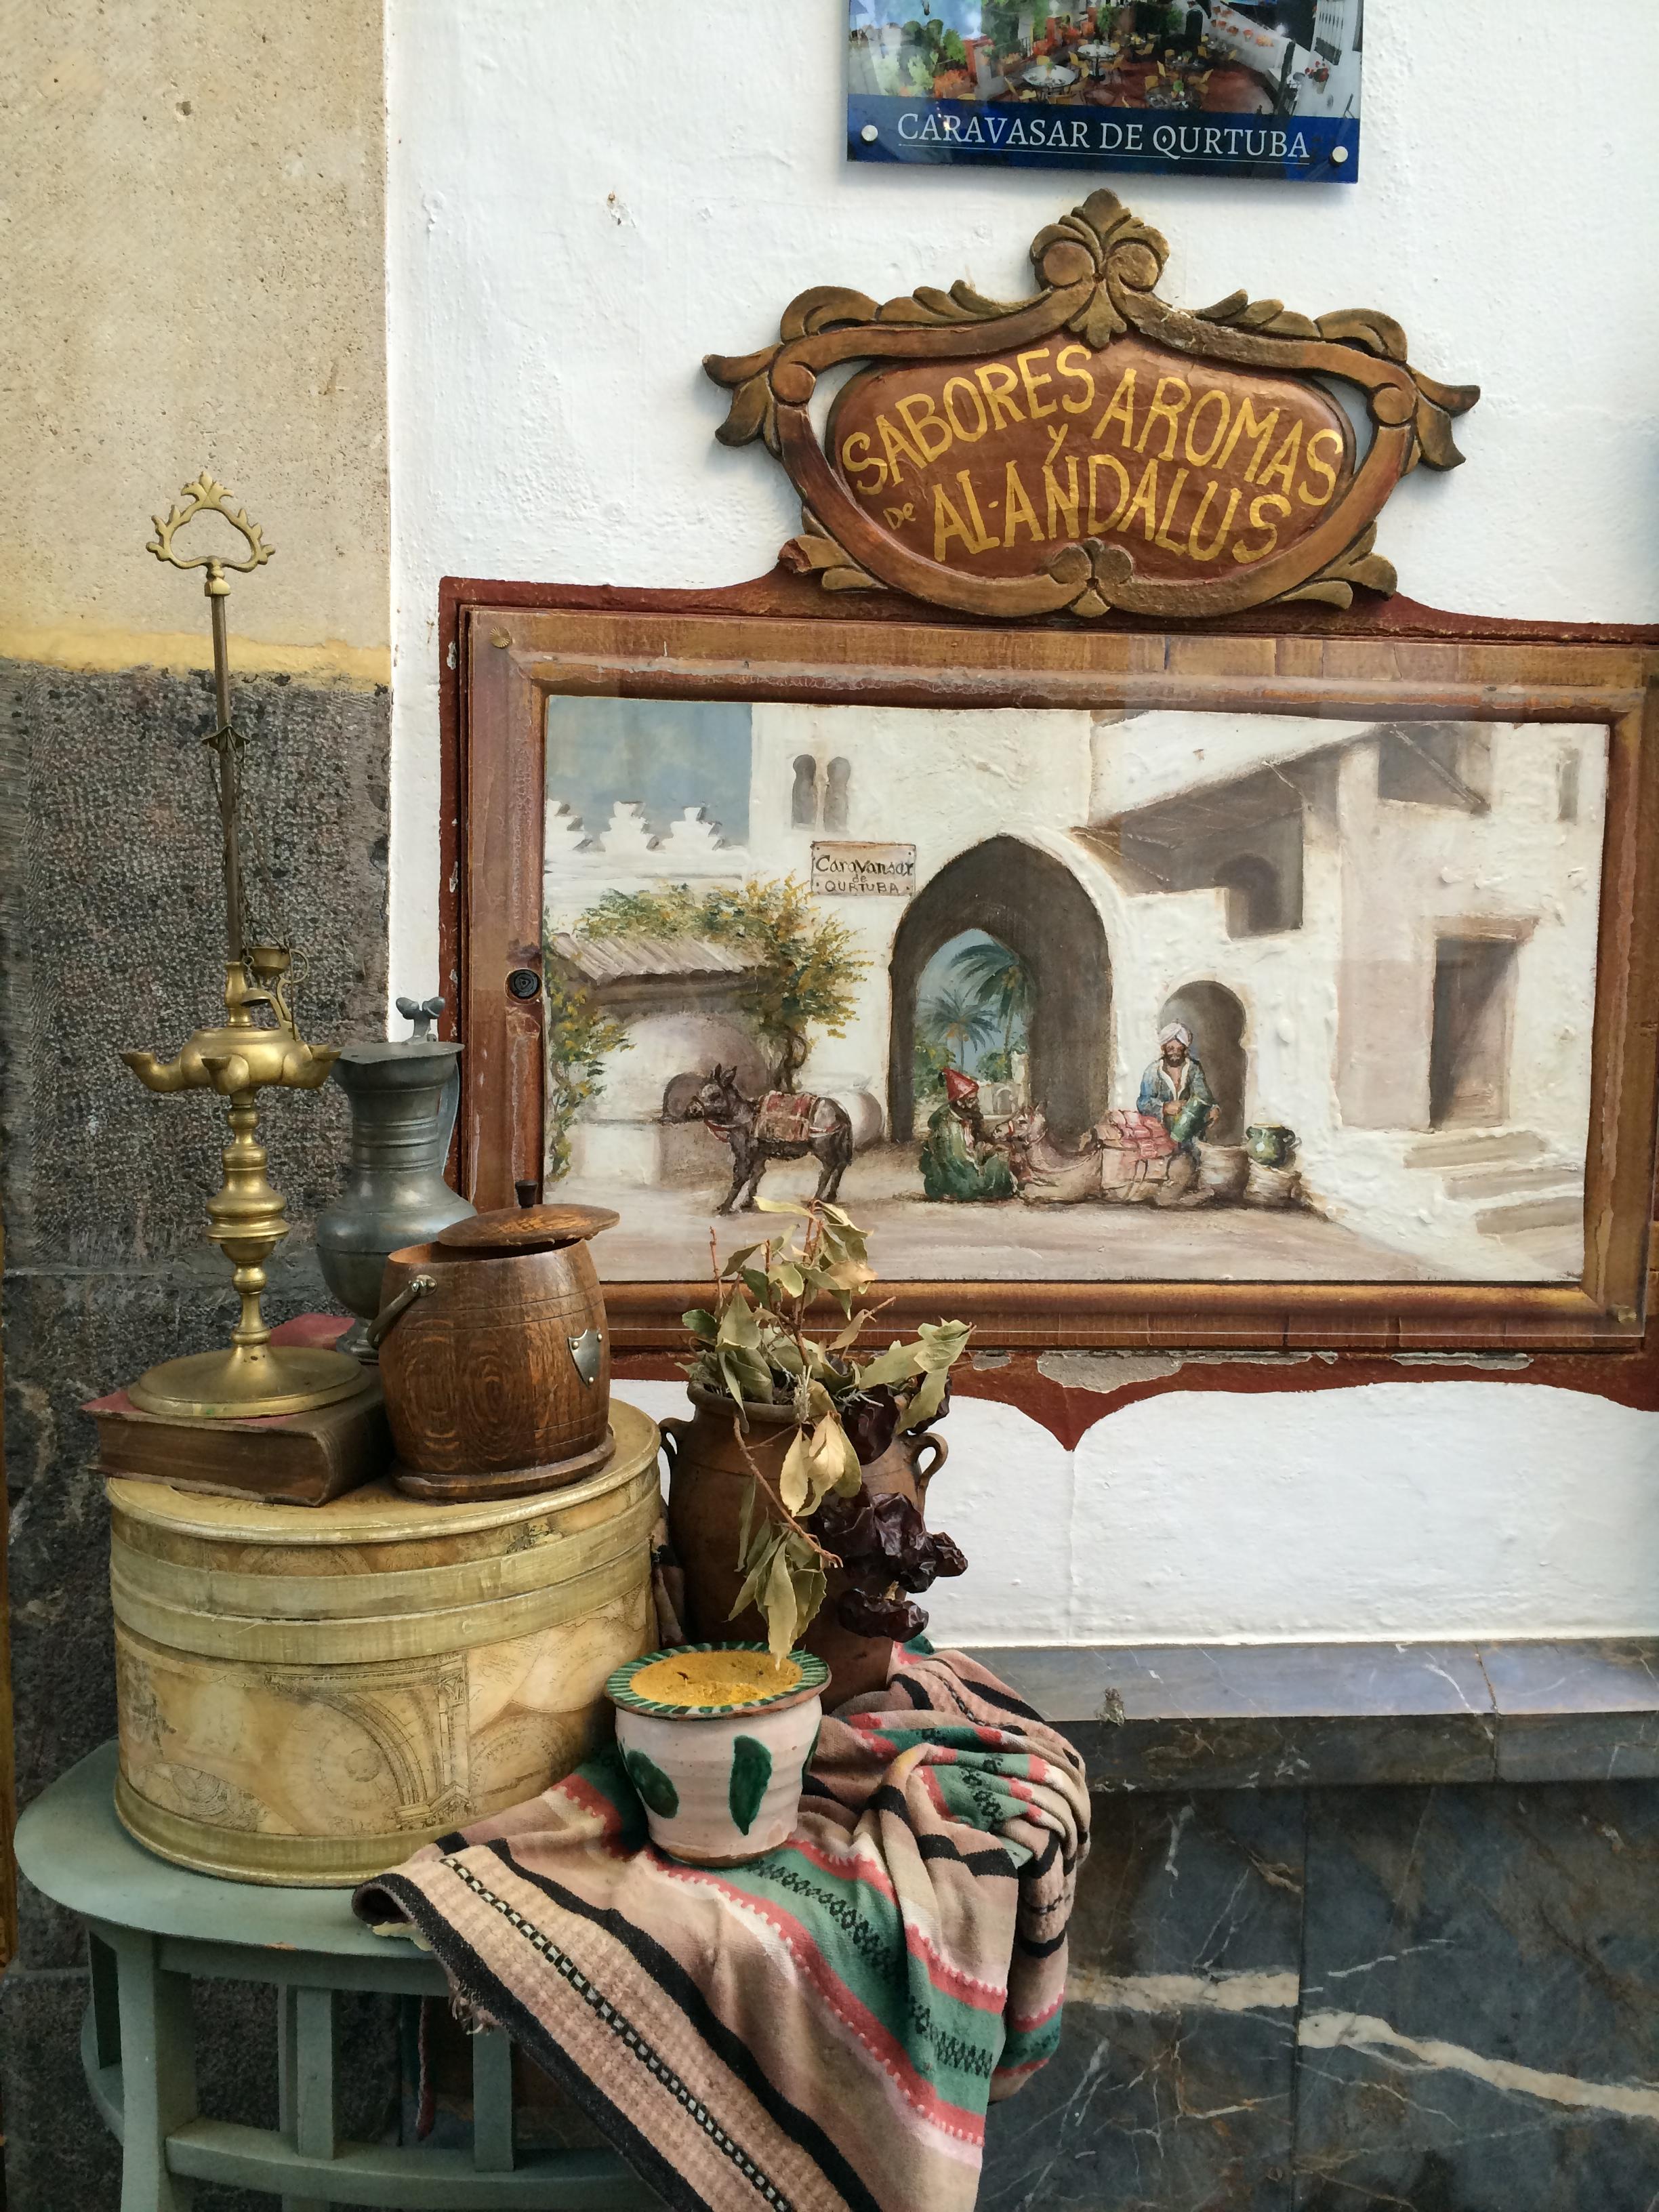 caravasar qurtuba. Córdoba. notas con estilo